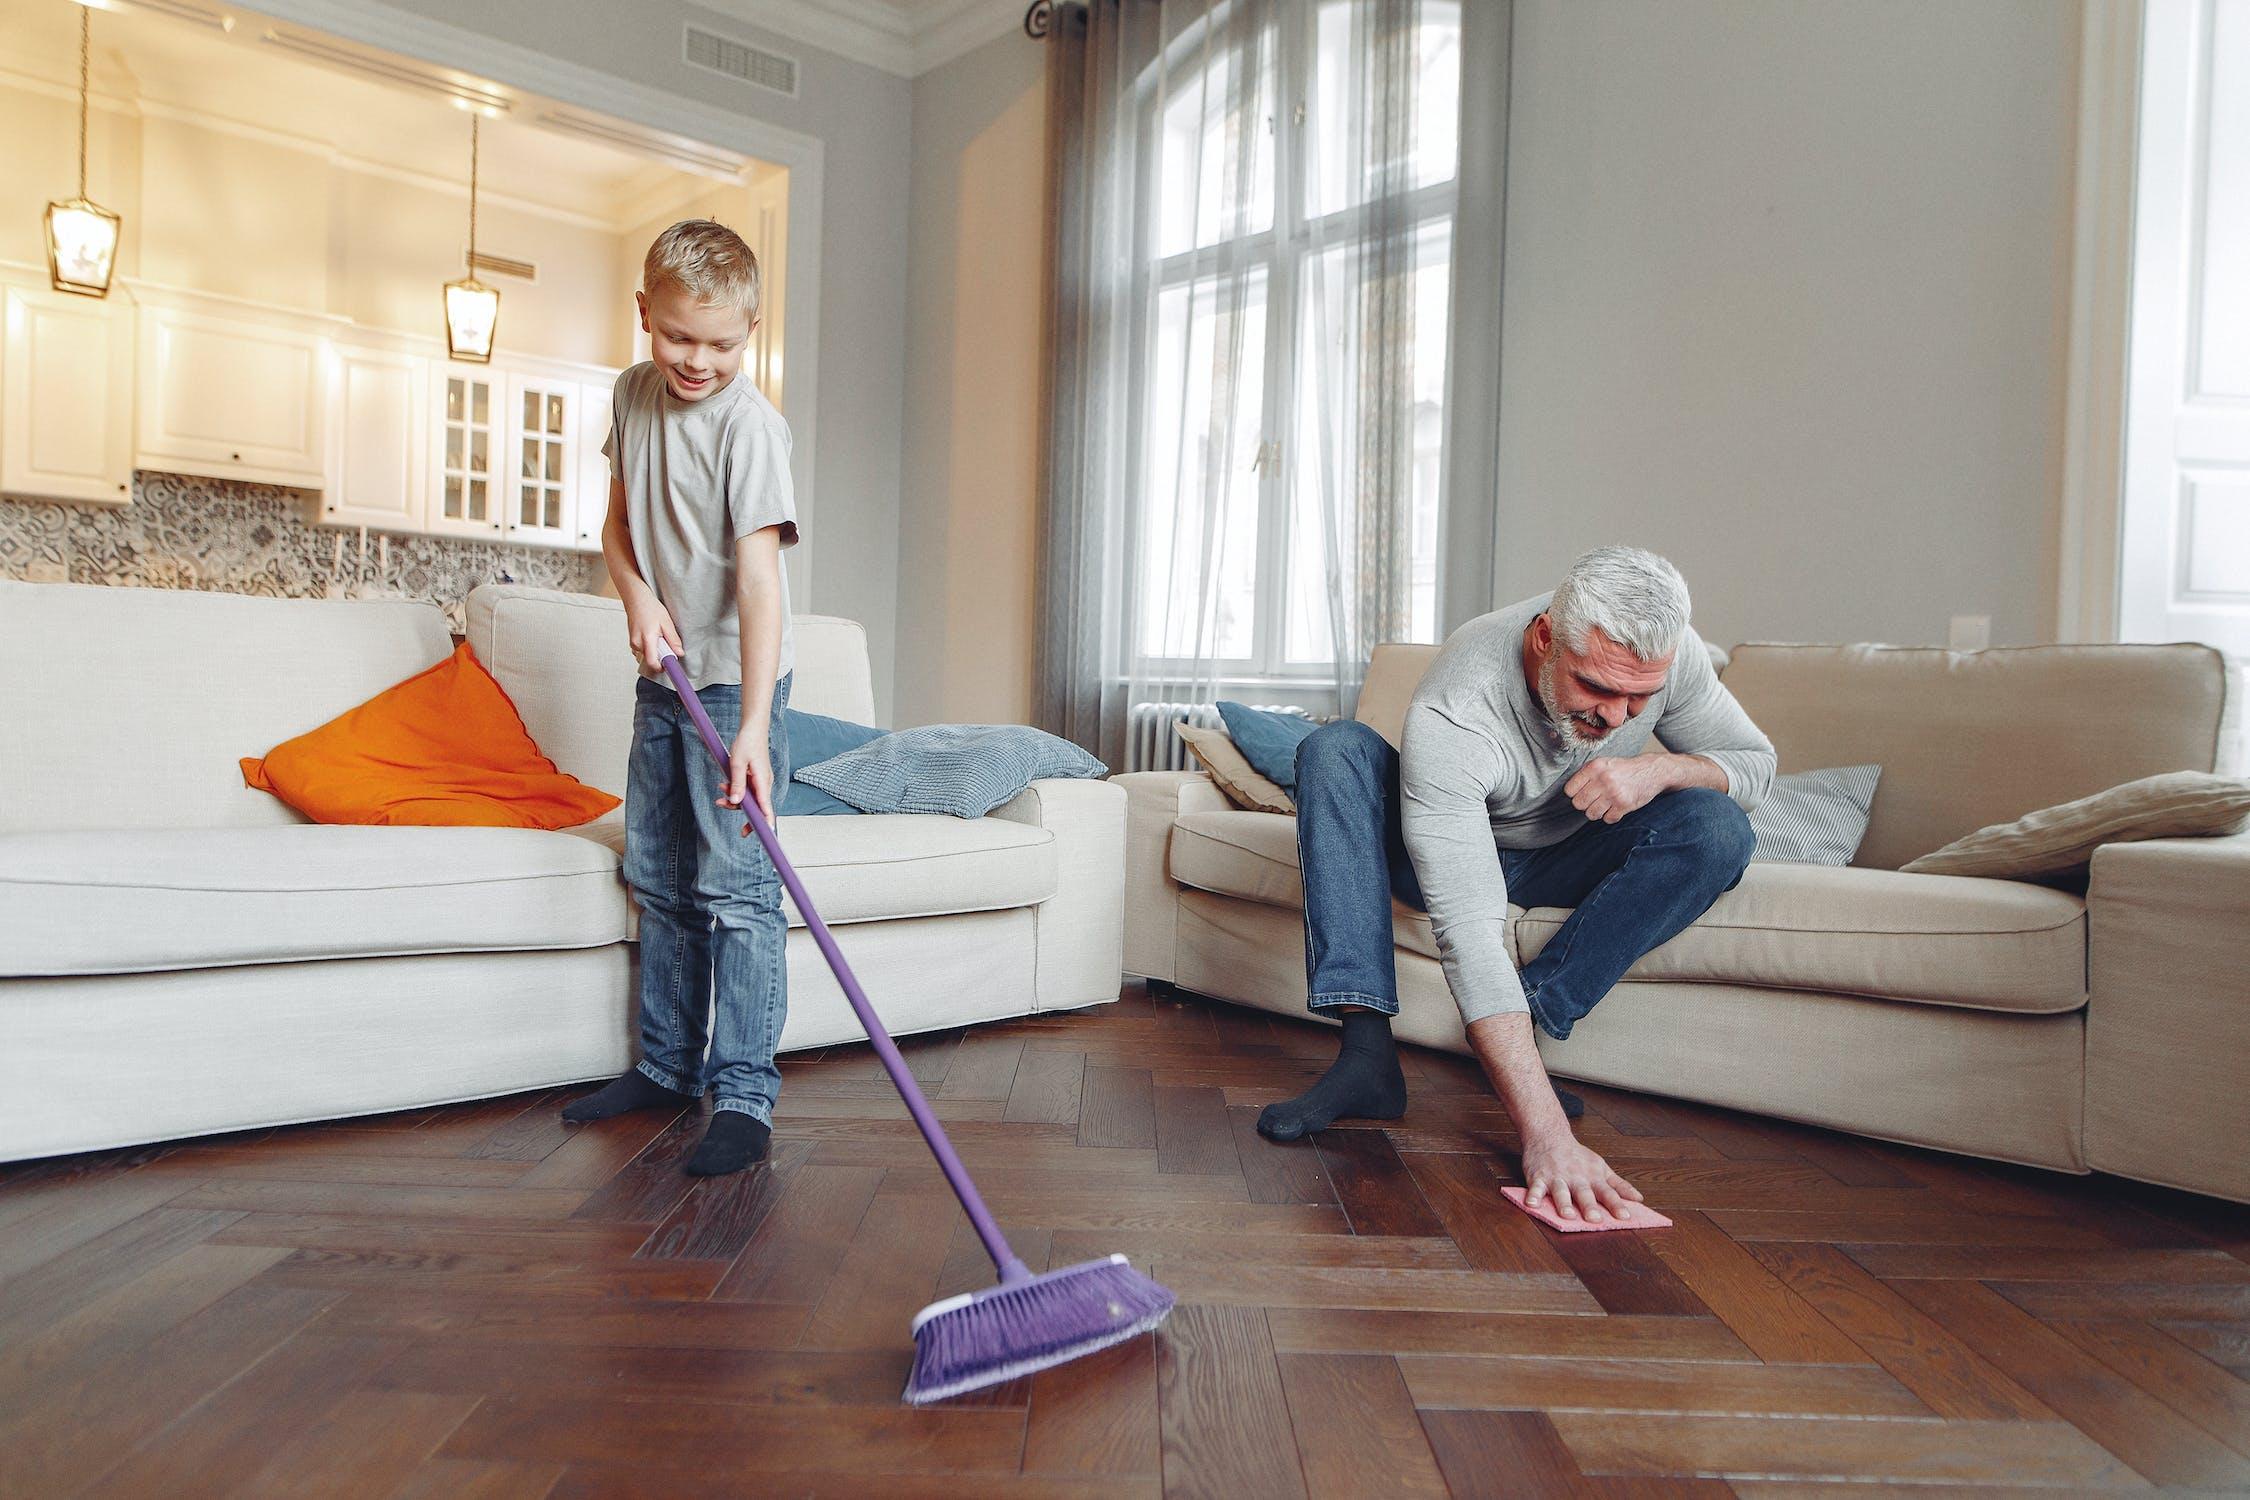 4 Vital Spring Home Care Tips